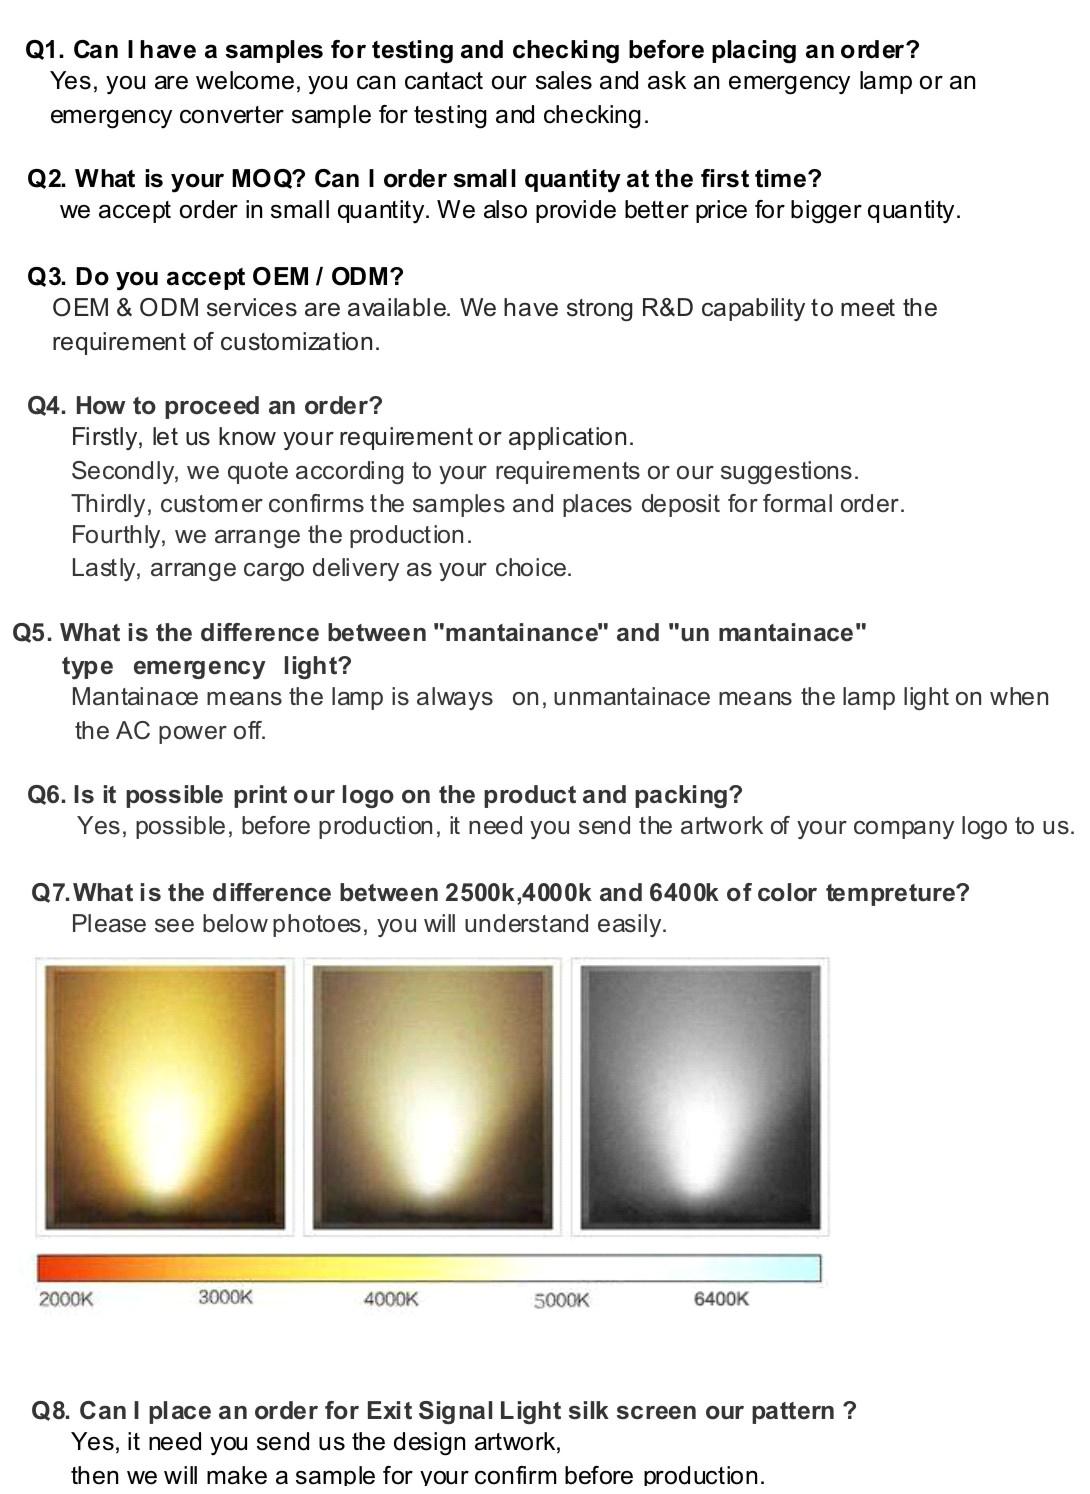 Kualitas Tinggi IP65 Tahan Air LED Emergency Lampu Plafon/Darurat Lampu Langit-langit